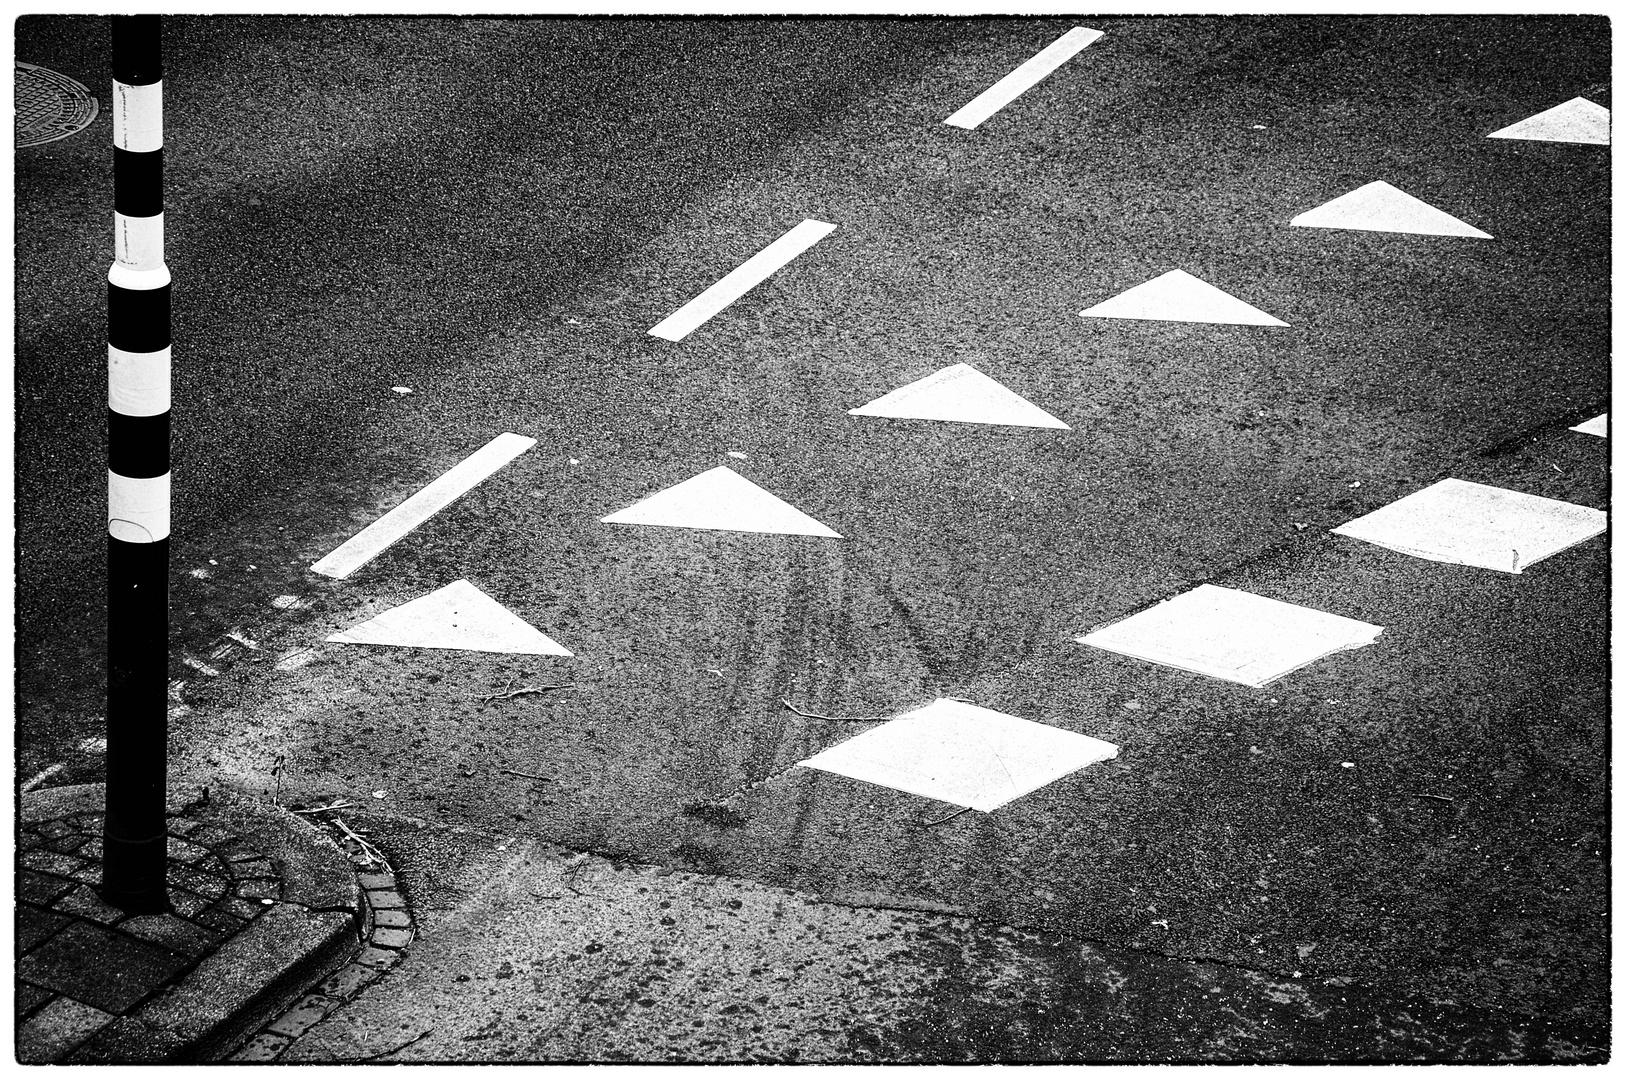 Traffic Marks #2